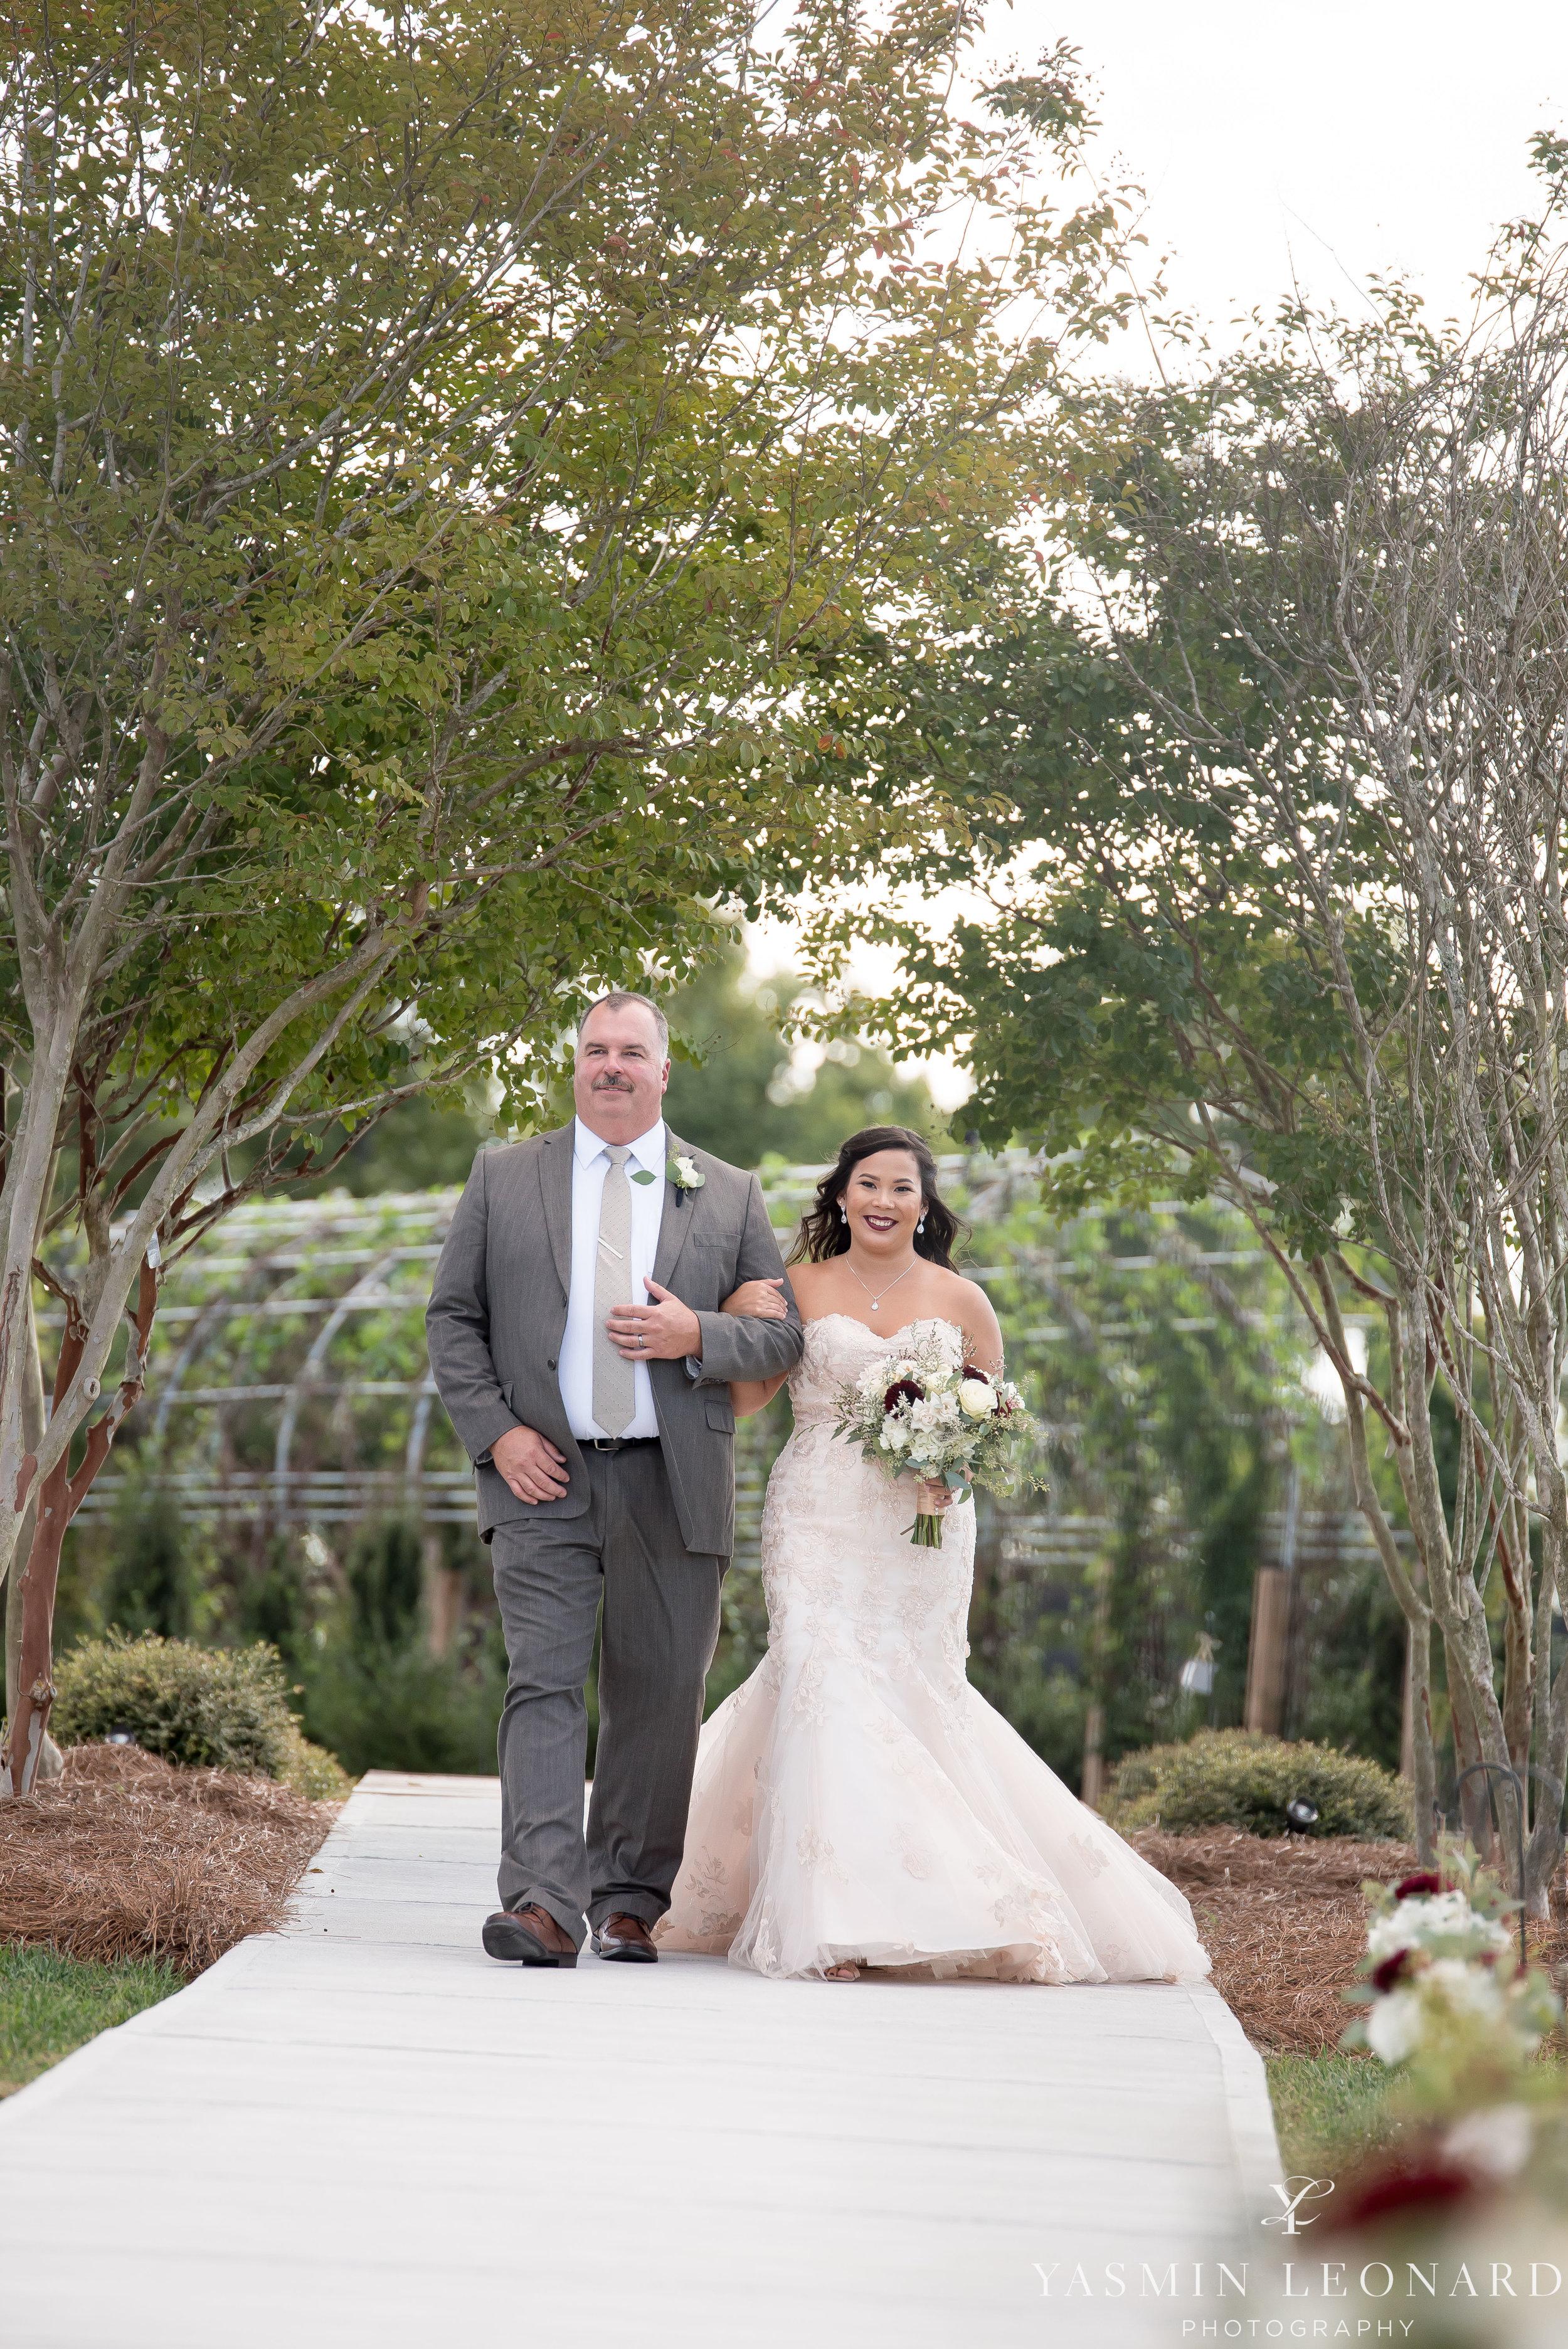 Mason Ridge   Liberty, NC   Aylissa and John   Yasmin Leonard Photography-56.jpg